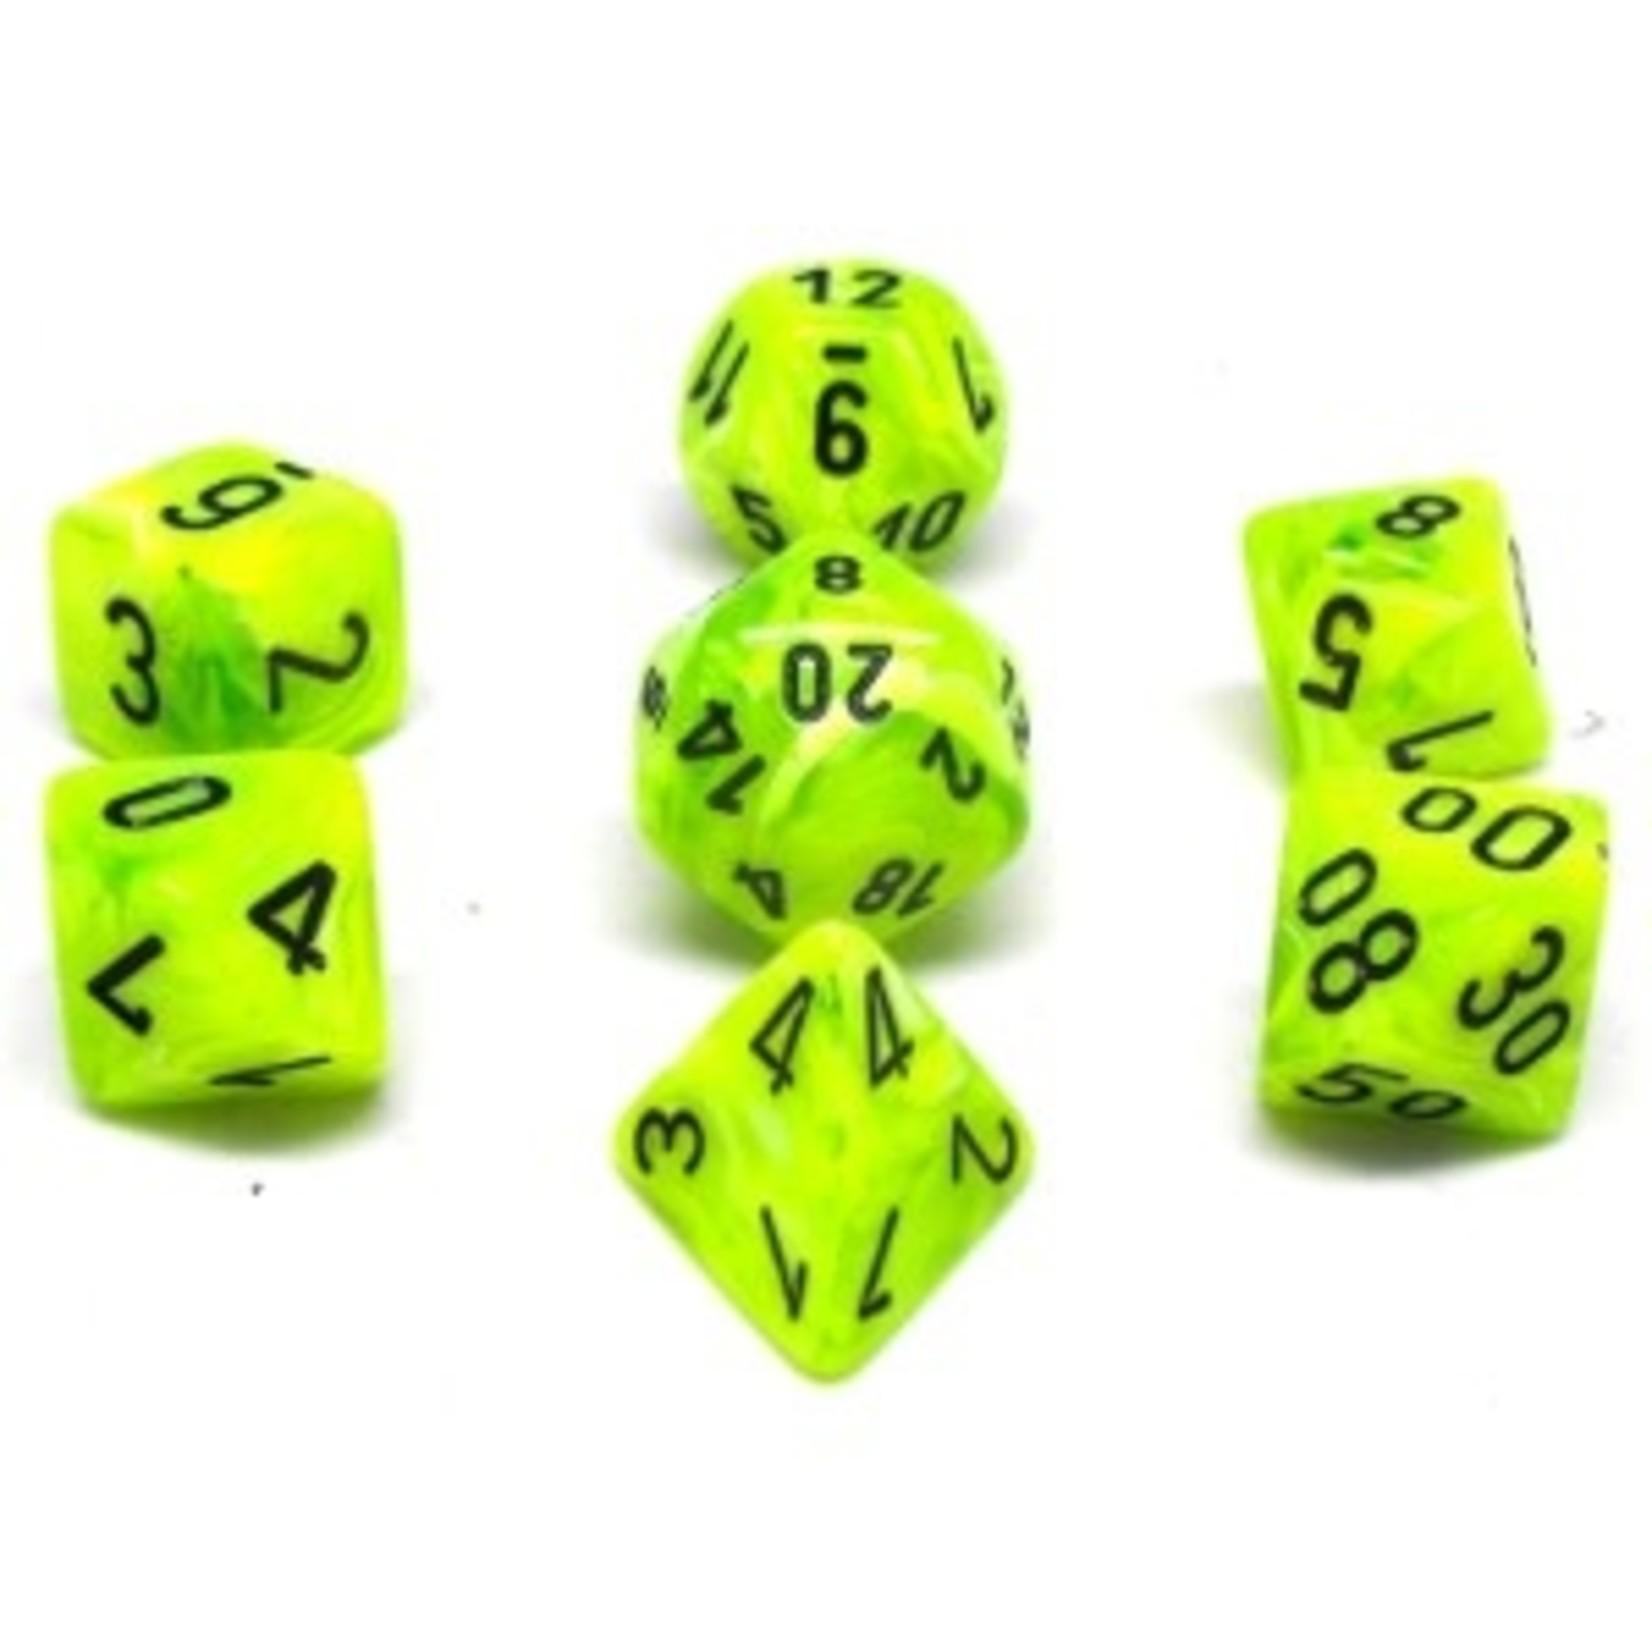 Chessex Set 7D Poly Vortex Bright Green/Black